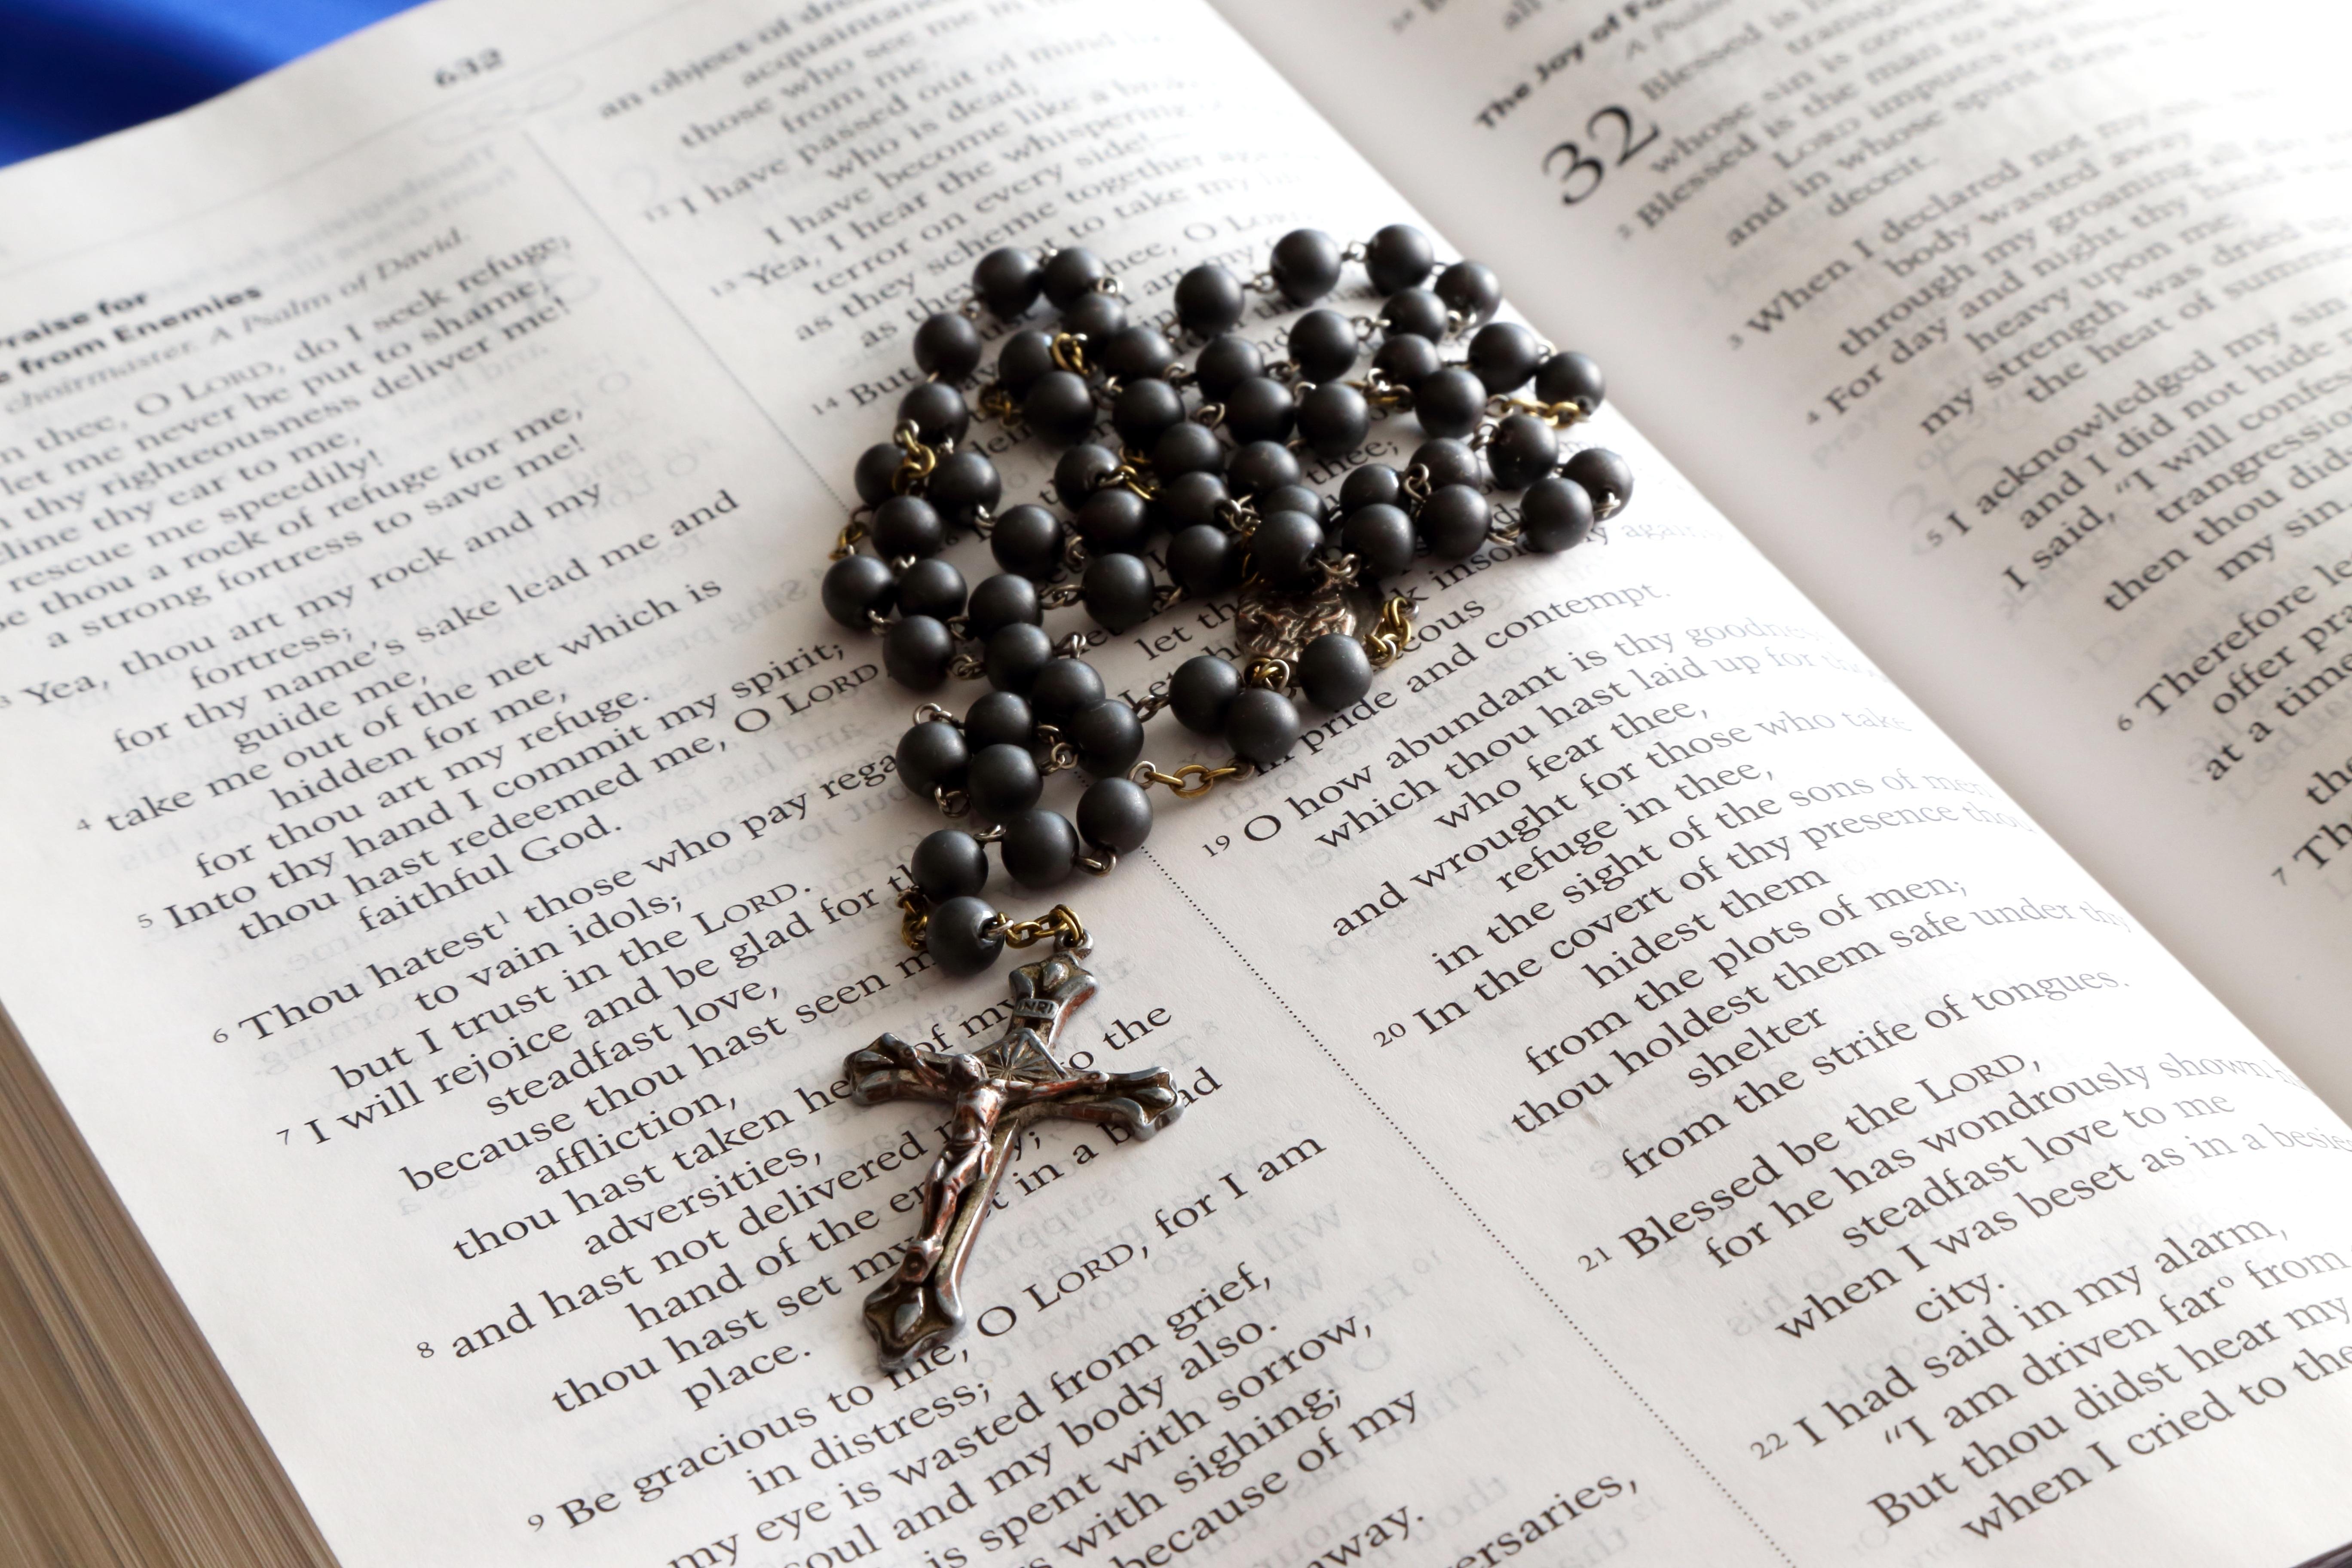 44 Koleksi Gambar Kata Kata Rohani Gratis